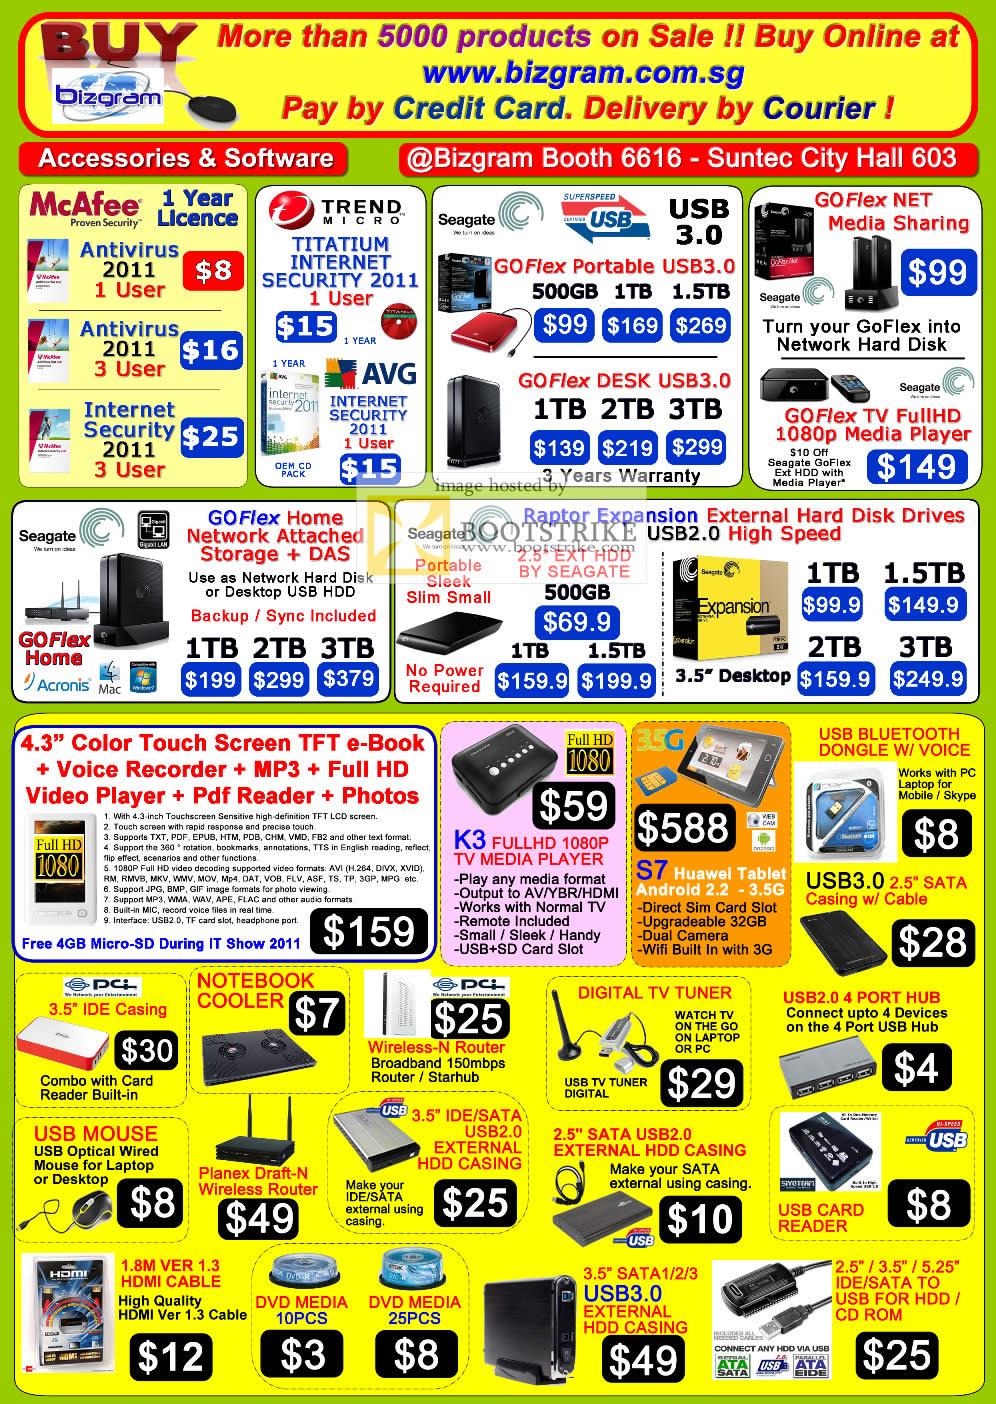 IT Show 2011 price list image brochure of Bizgram Accessories Antivirus Mcafee Trend Micro Seagate External Storage GoFlex NAS Raptor Expansion Media Player K3 S7 Huawei Router